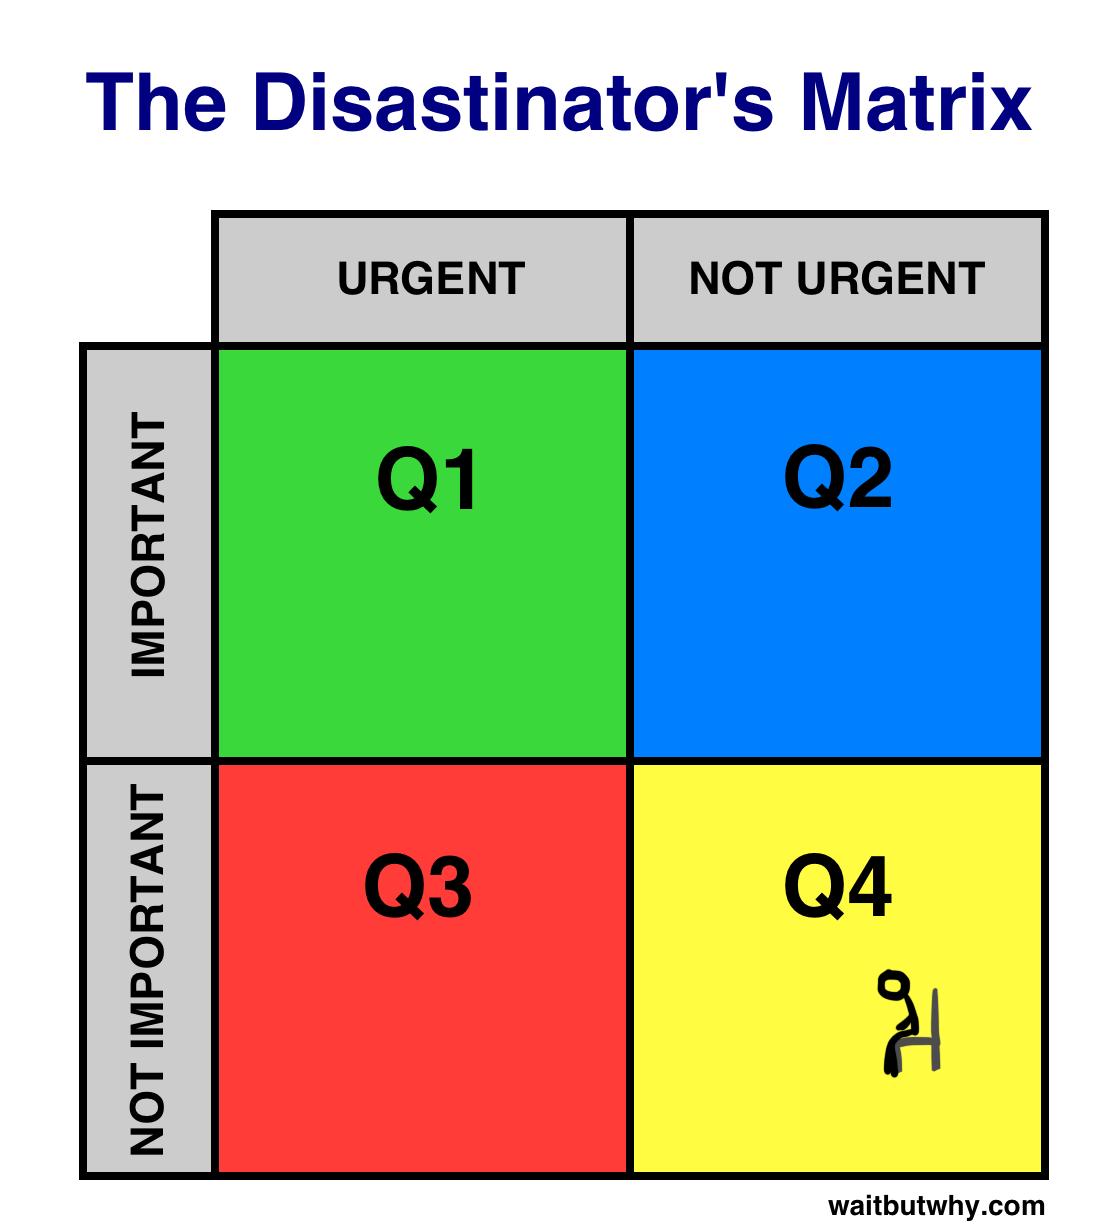 Disastinator's Matrix